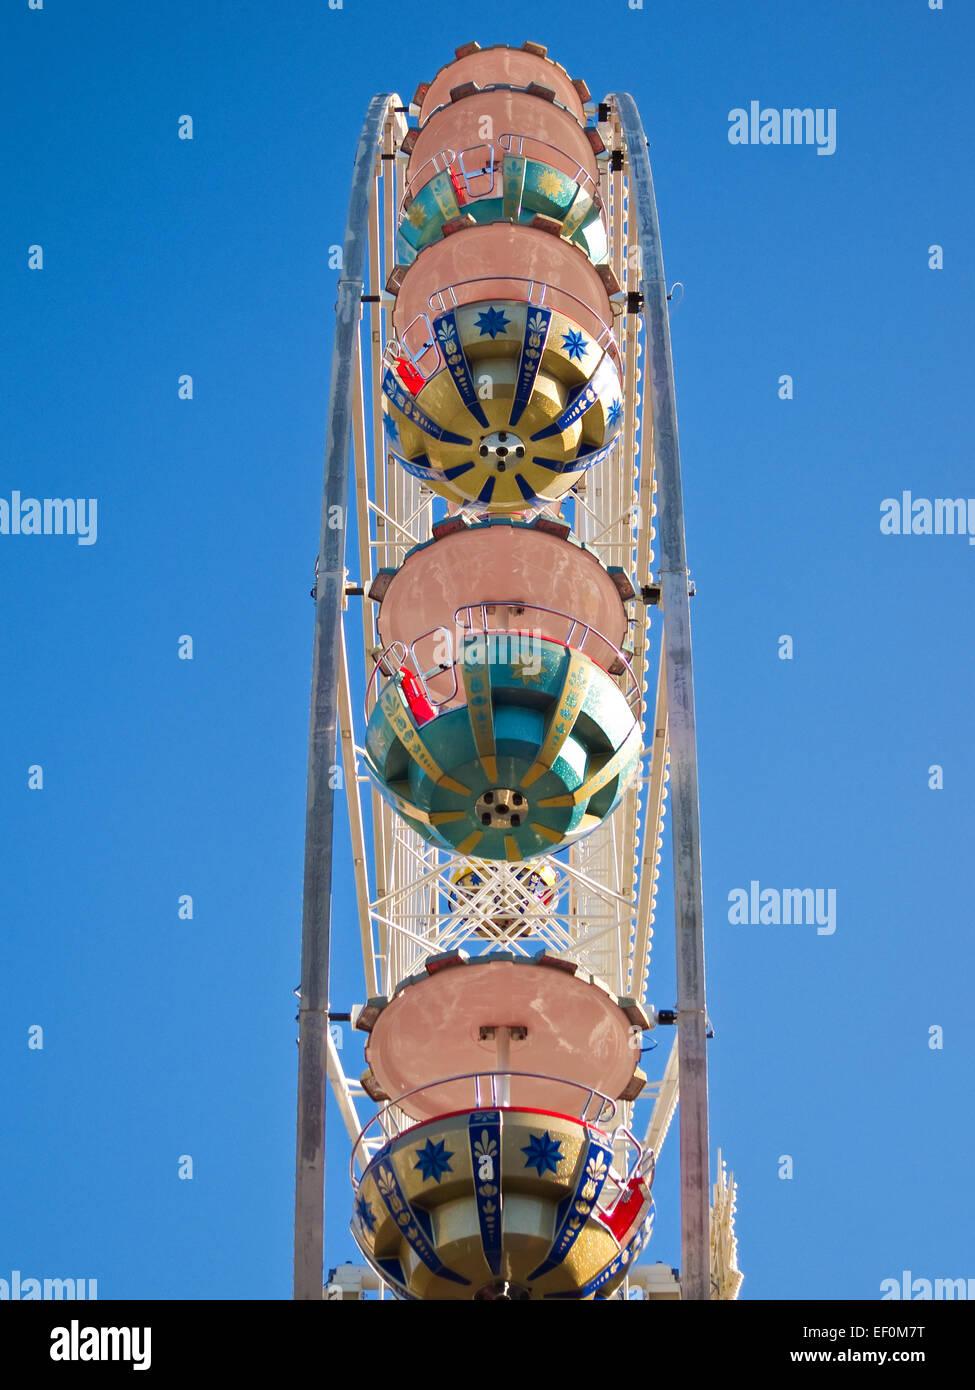 A Ferris wheel. - Stock Image